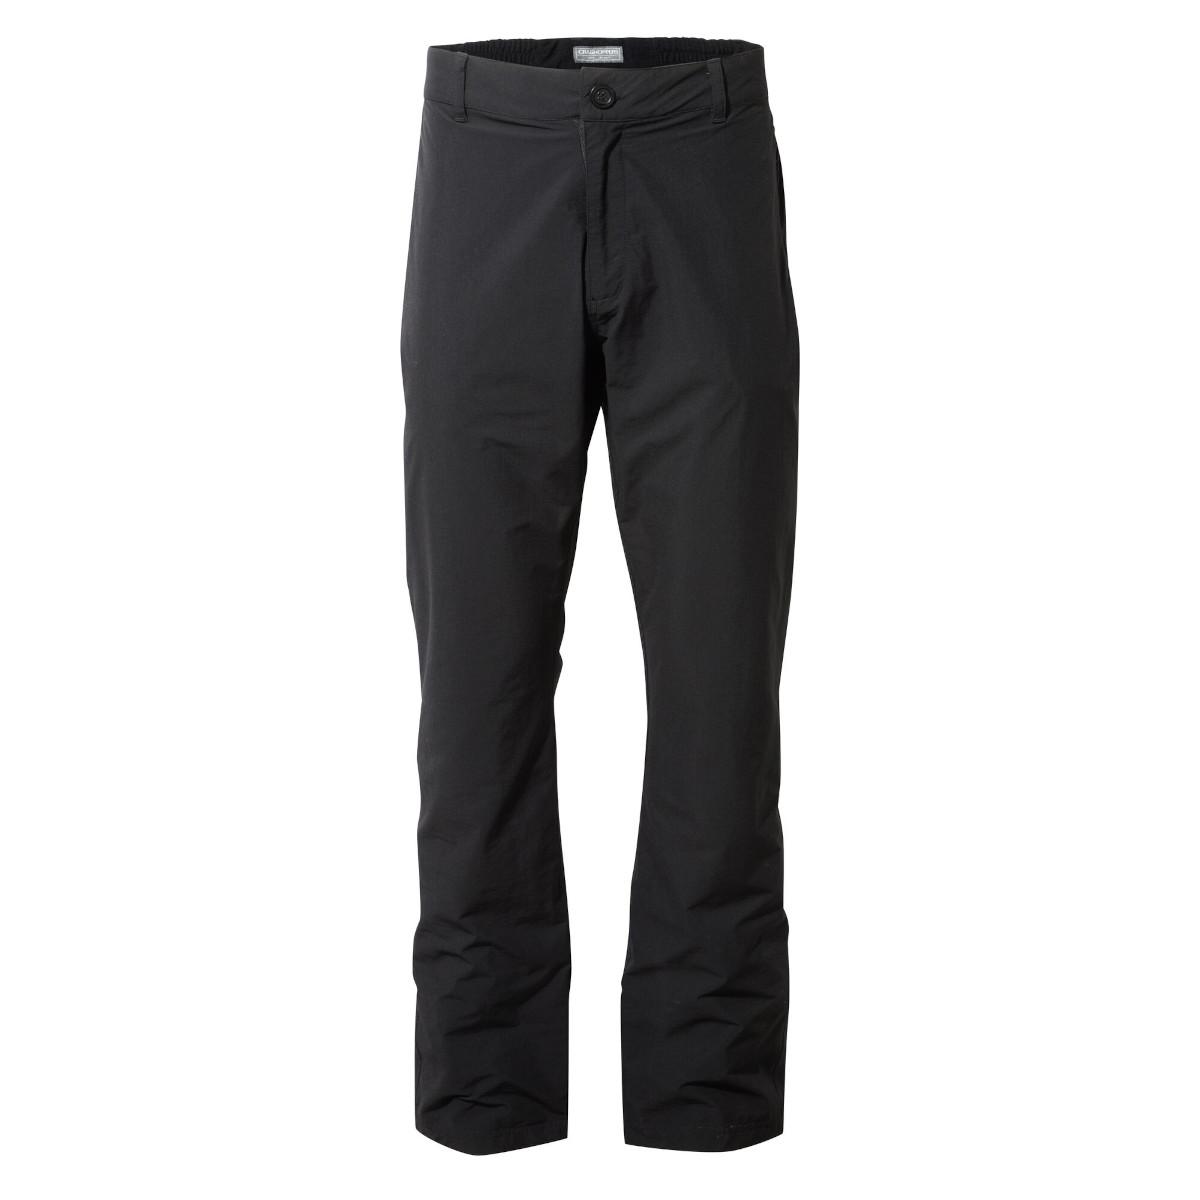 Craghoppers Kiwi Pro Waterproof Trousers - Black